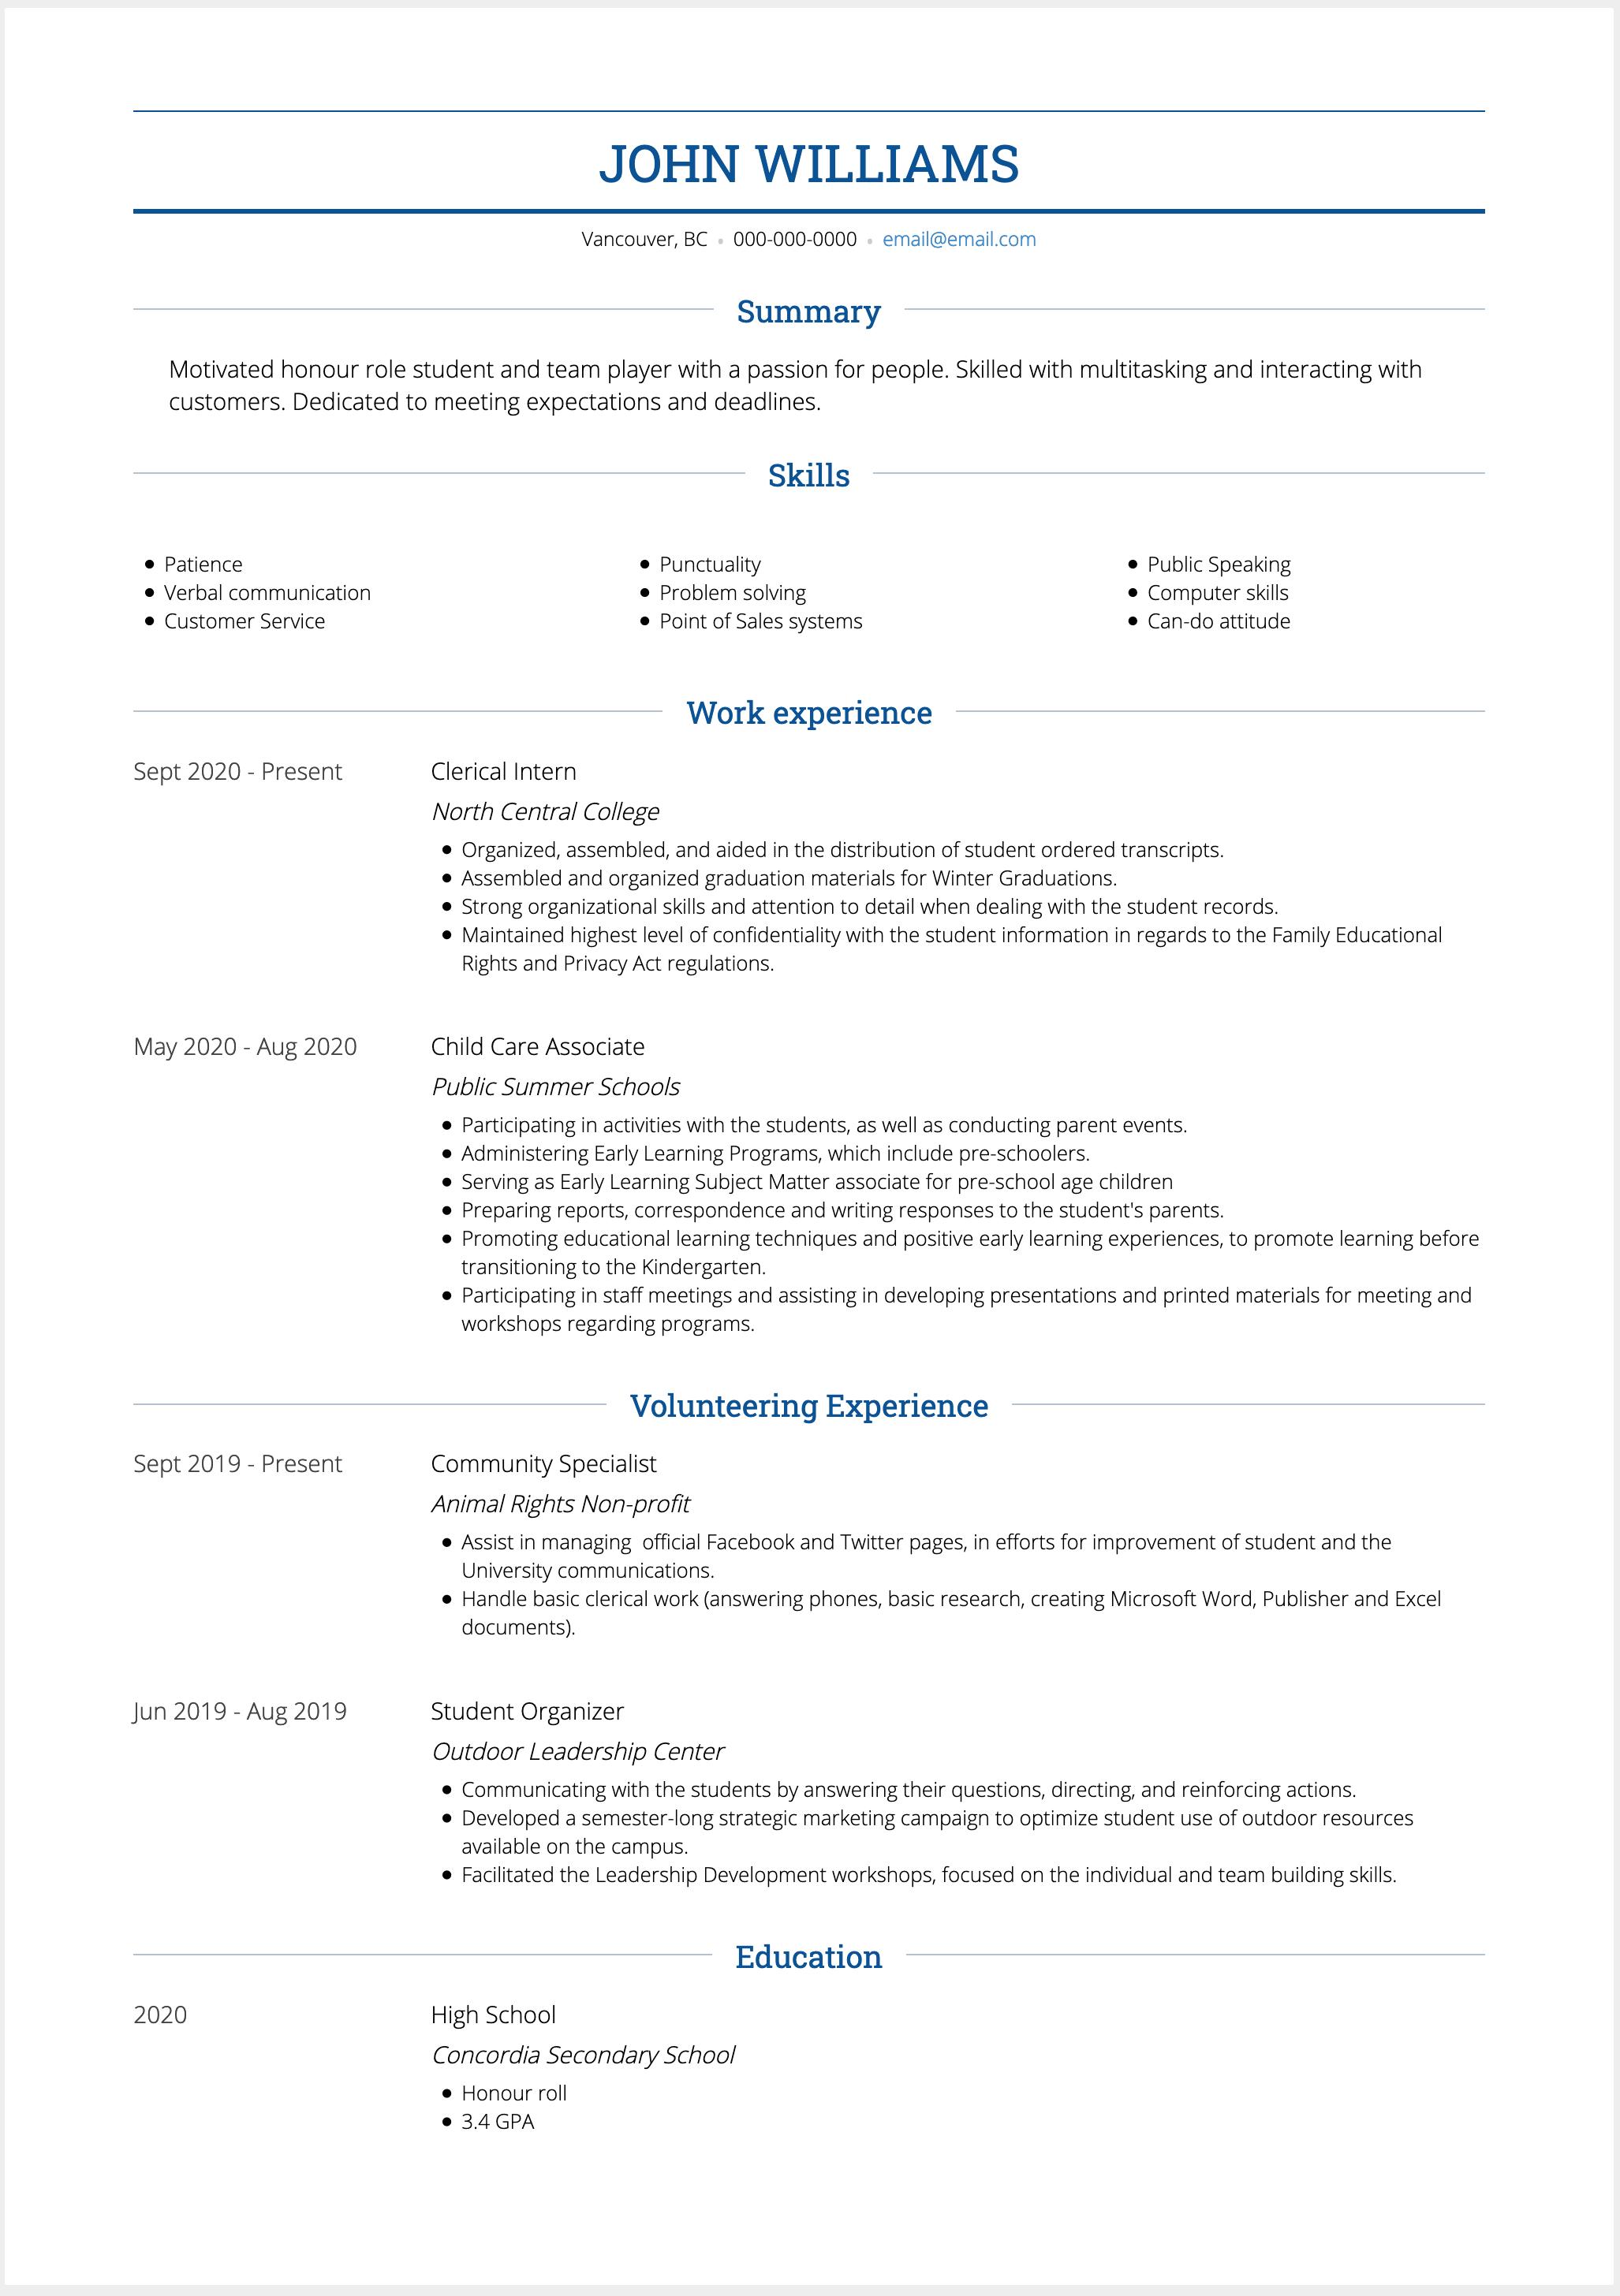 High School Resume Example Image